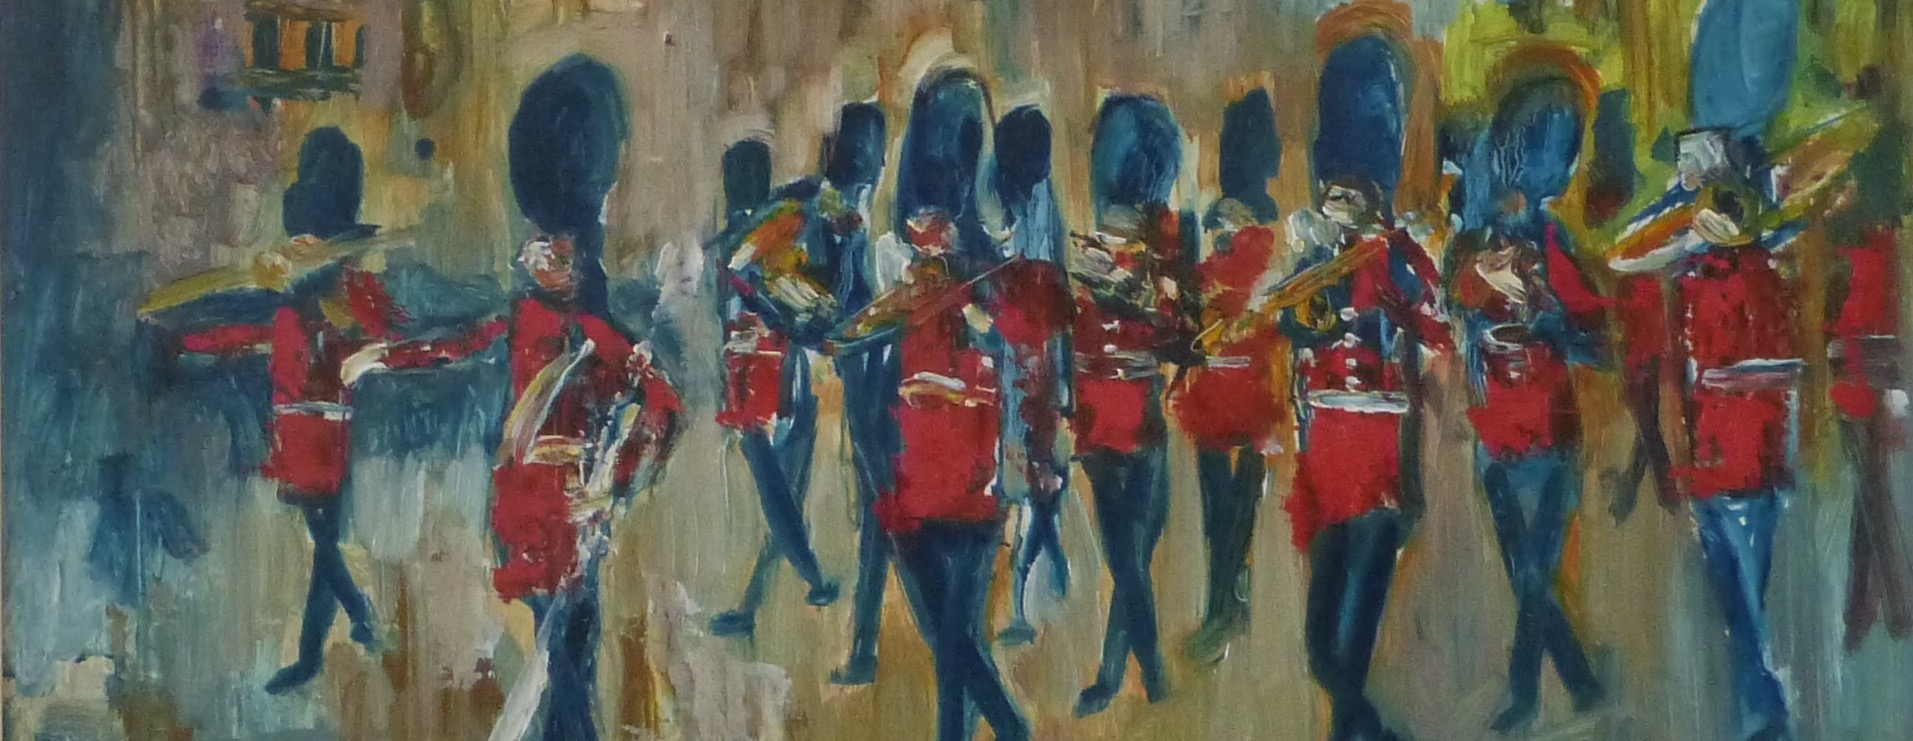 James Lawrence Isherwood London painting guards